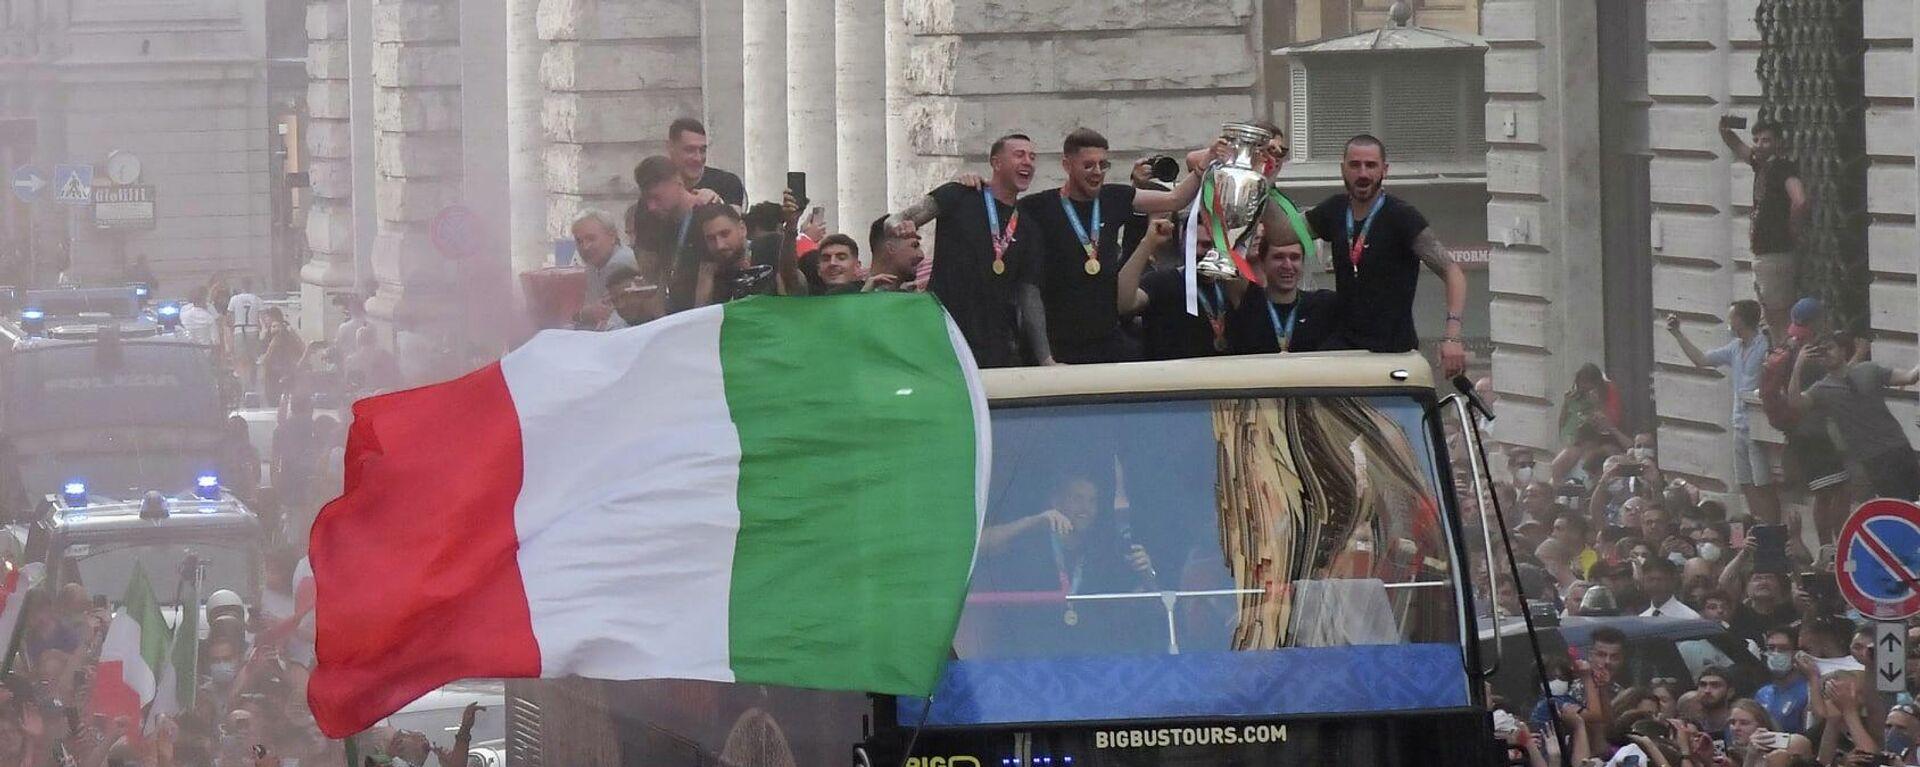 Italia Campione d'Europa - Sputnik Italia, 1920, 14.07.2021